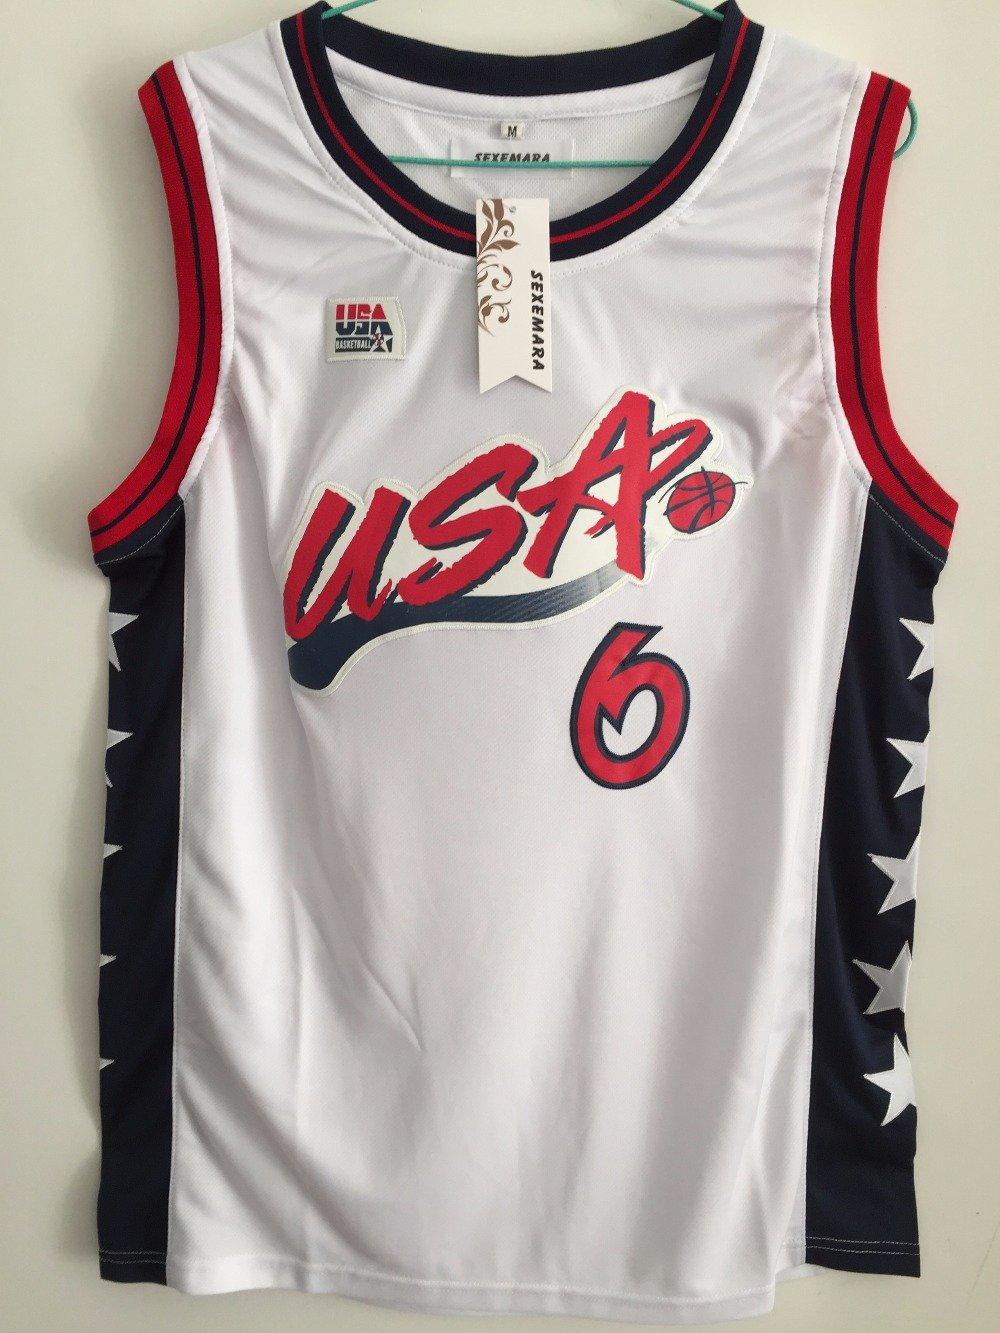 Penny Anfernee Hardaway #6 Throwback 1996 USA Basketball Jersey Stitched Sewn White